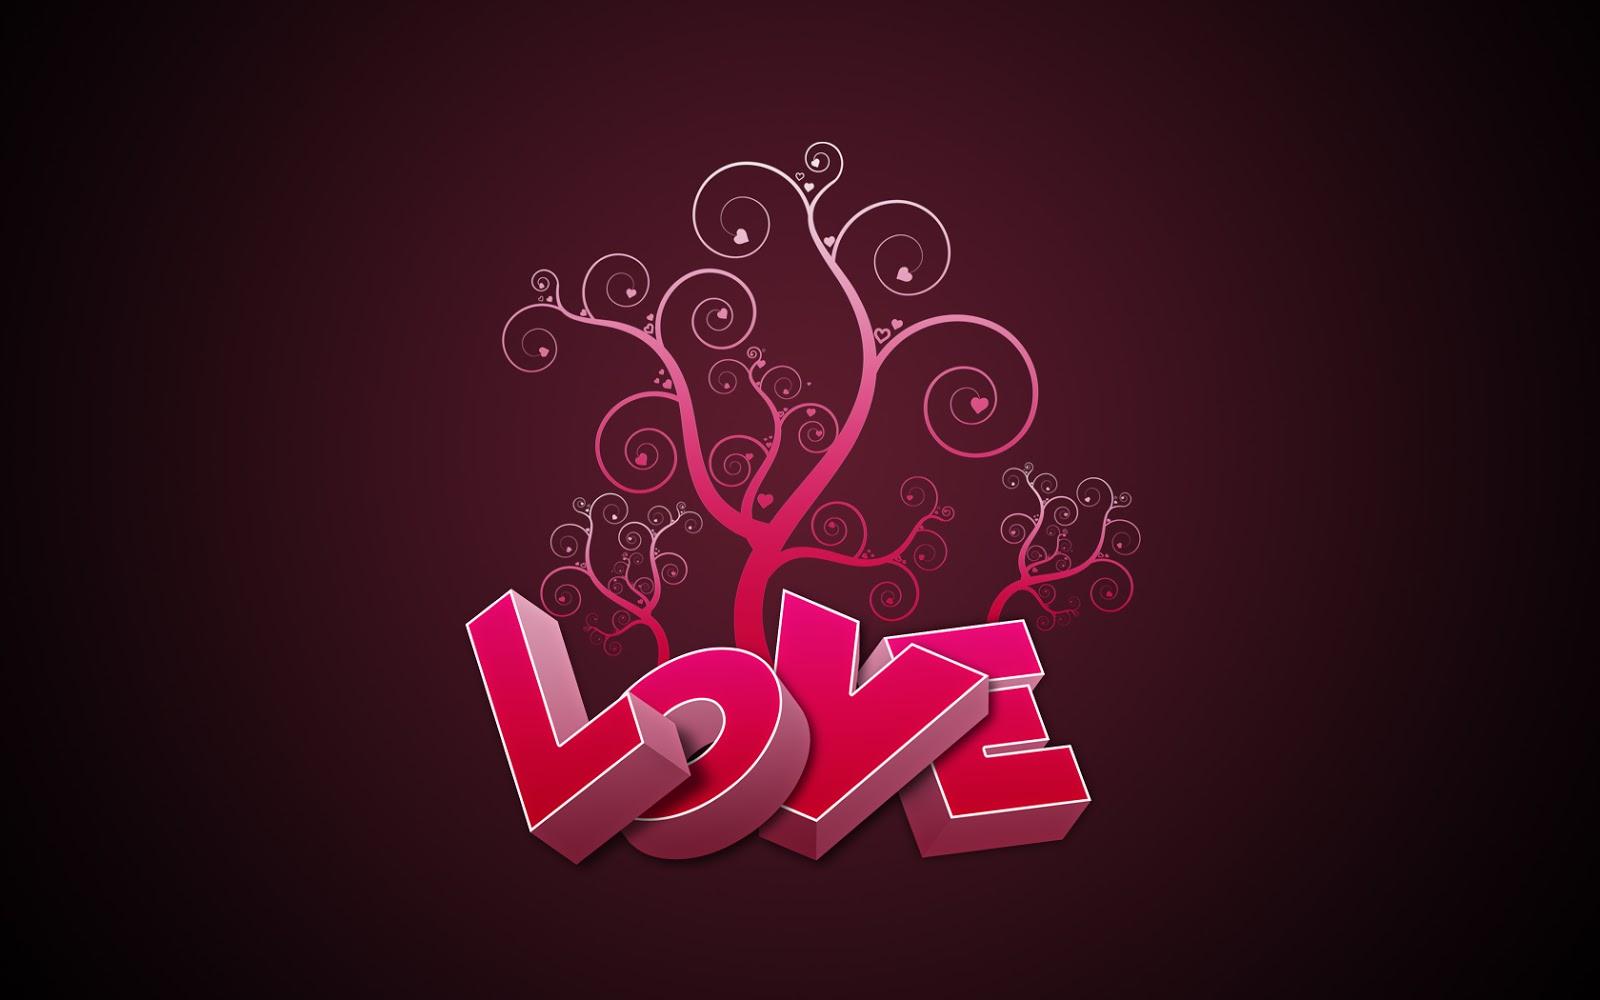 Gambar Cinta Hati Love Romantis Romantic Couple Wallpaper